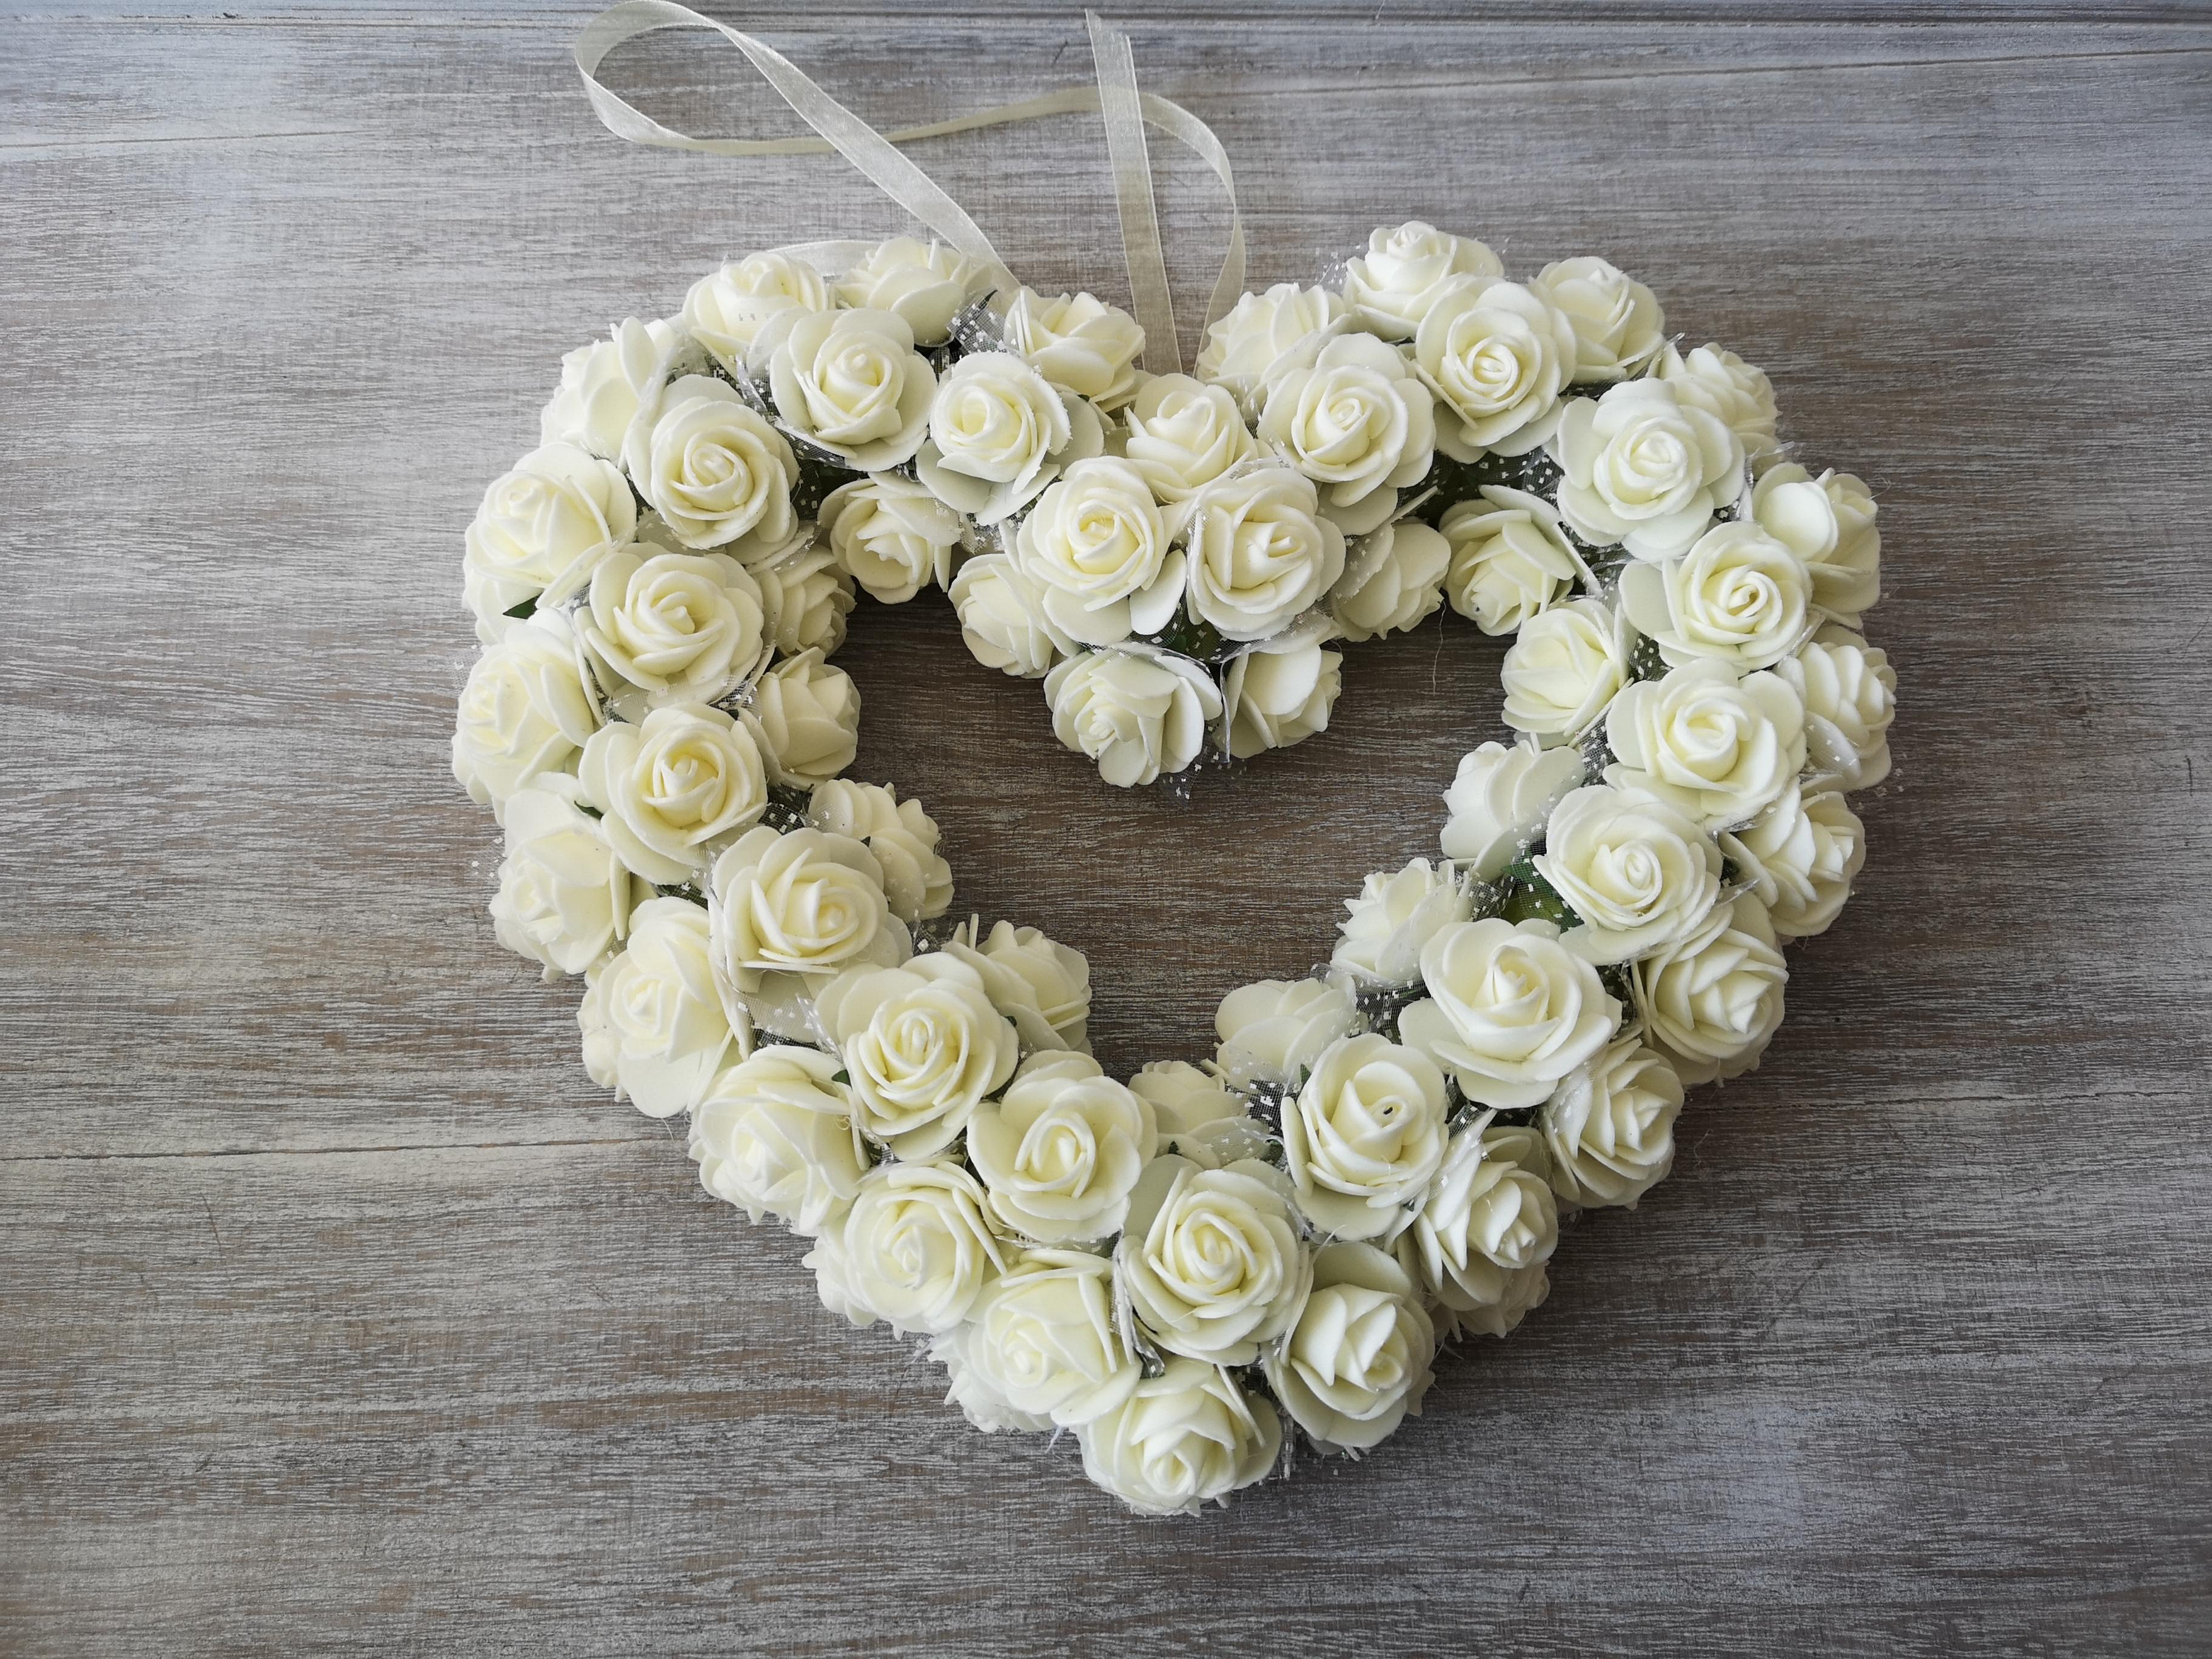 Large White Rose Heart Wreath Large-White-Rose-Heart-Wreath